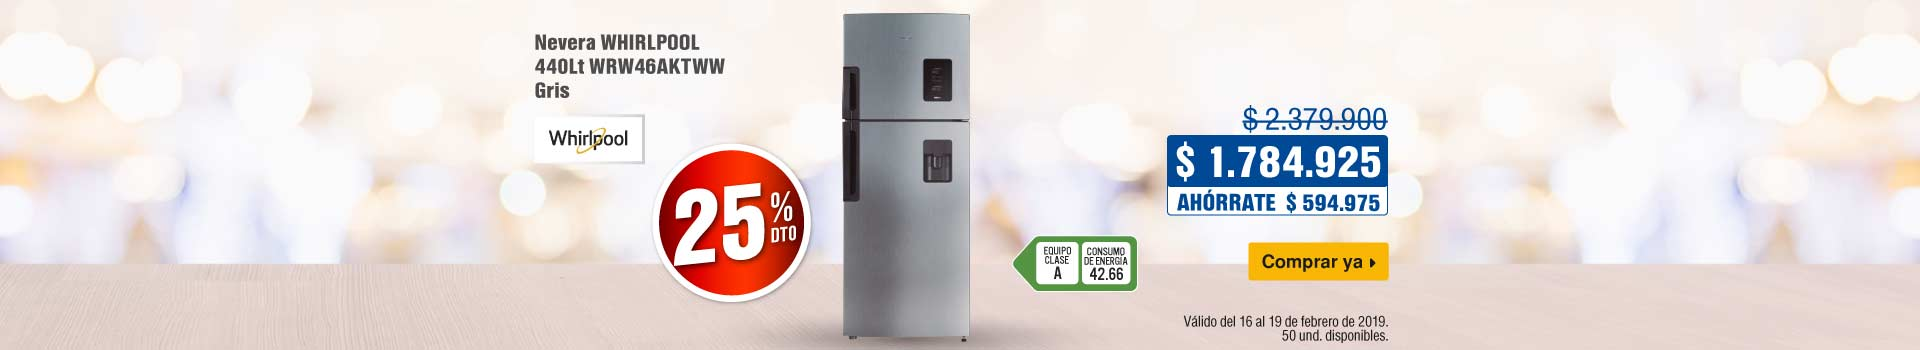 AK-KT-mayores-3-ELECT-BCAT-refrigeracion-150219